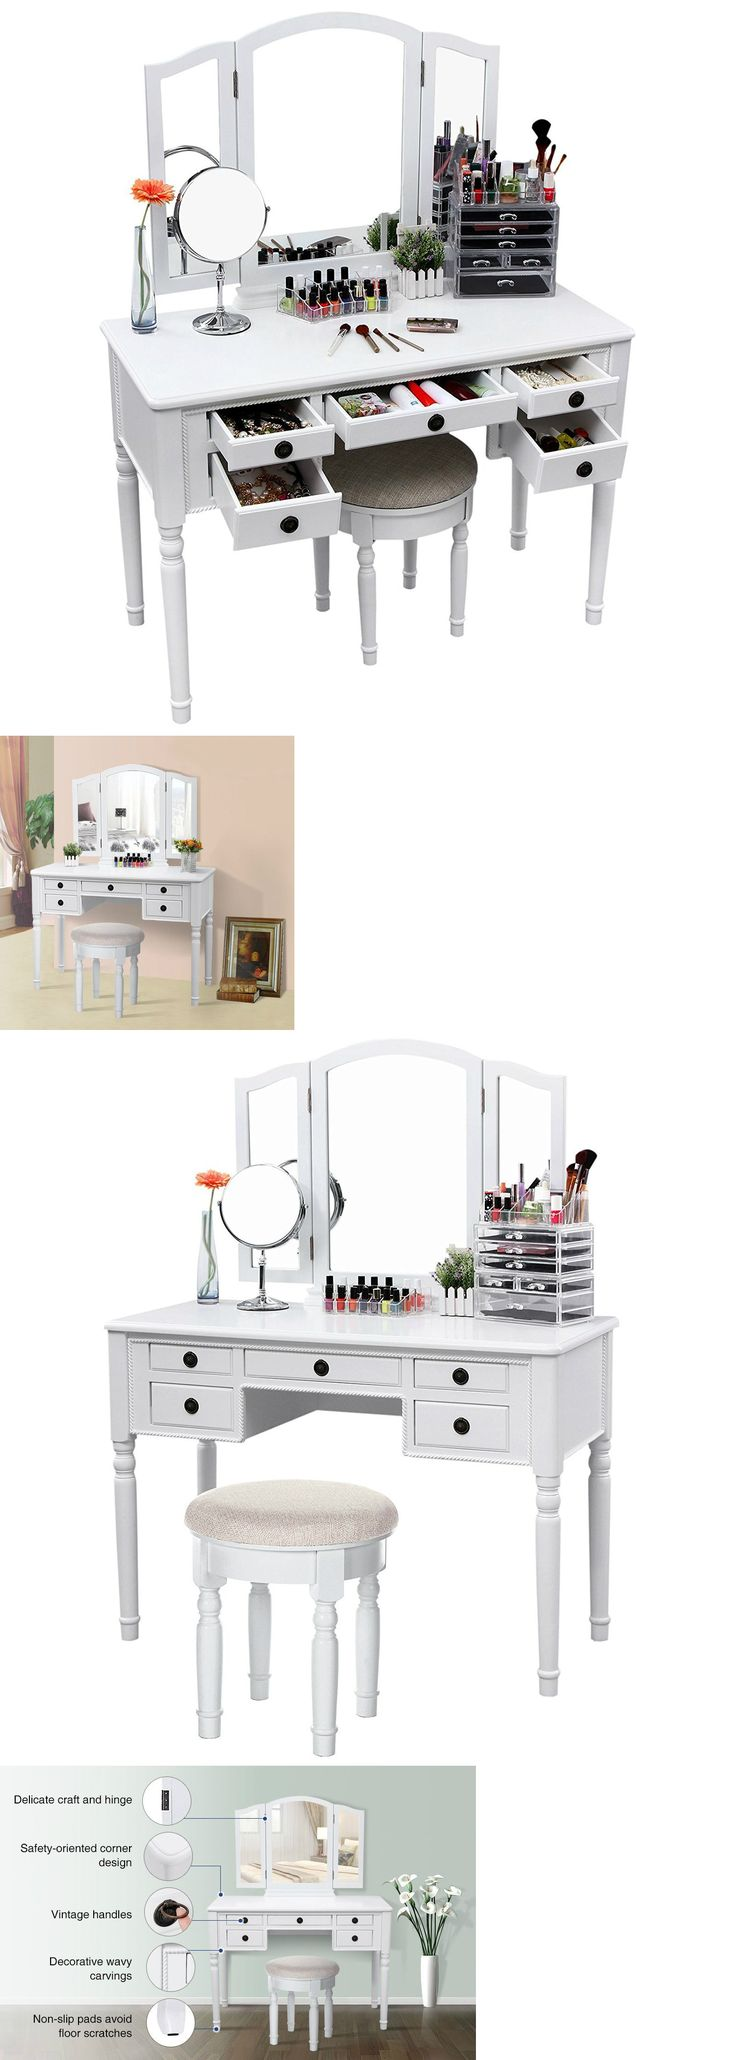 Black vanity salons vanities habitats the mirror outlets mirror - Vanities And Makeup Tables 32878 Mirrored Vanity Desk Makeup Set Dressing Table Top Stool Bedroom